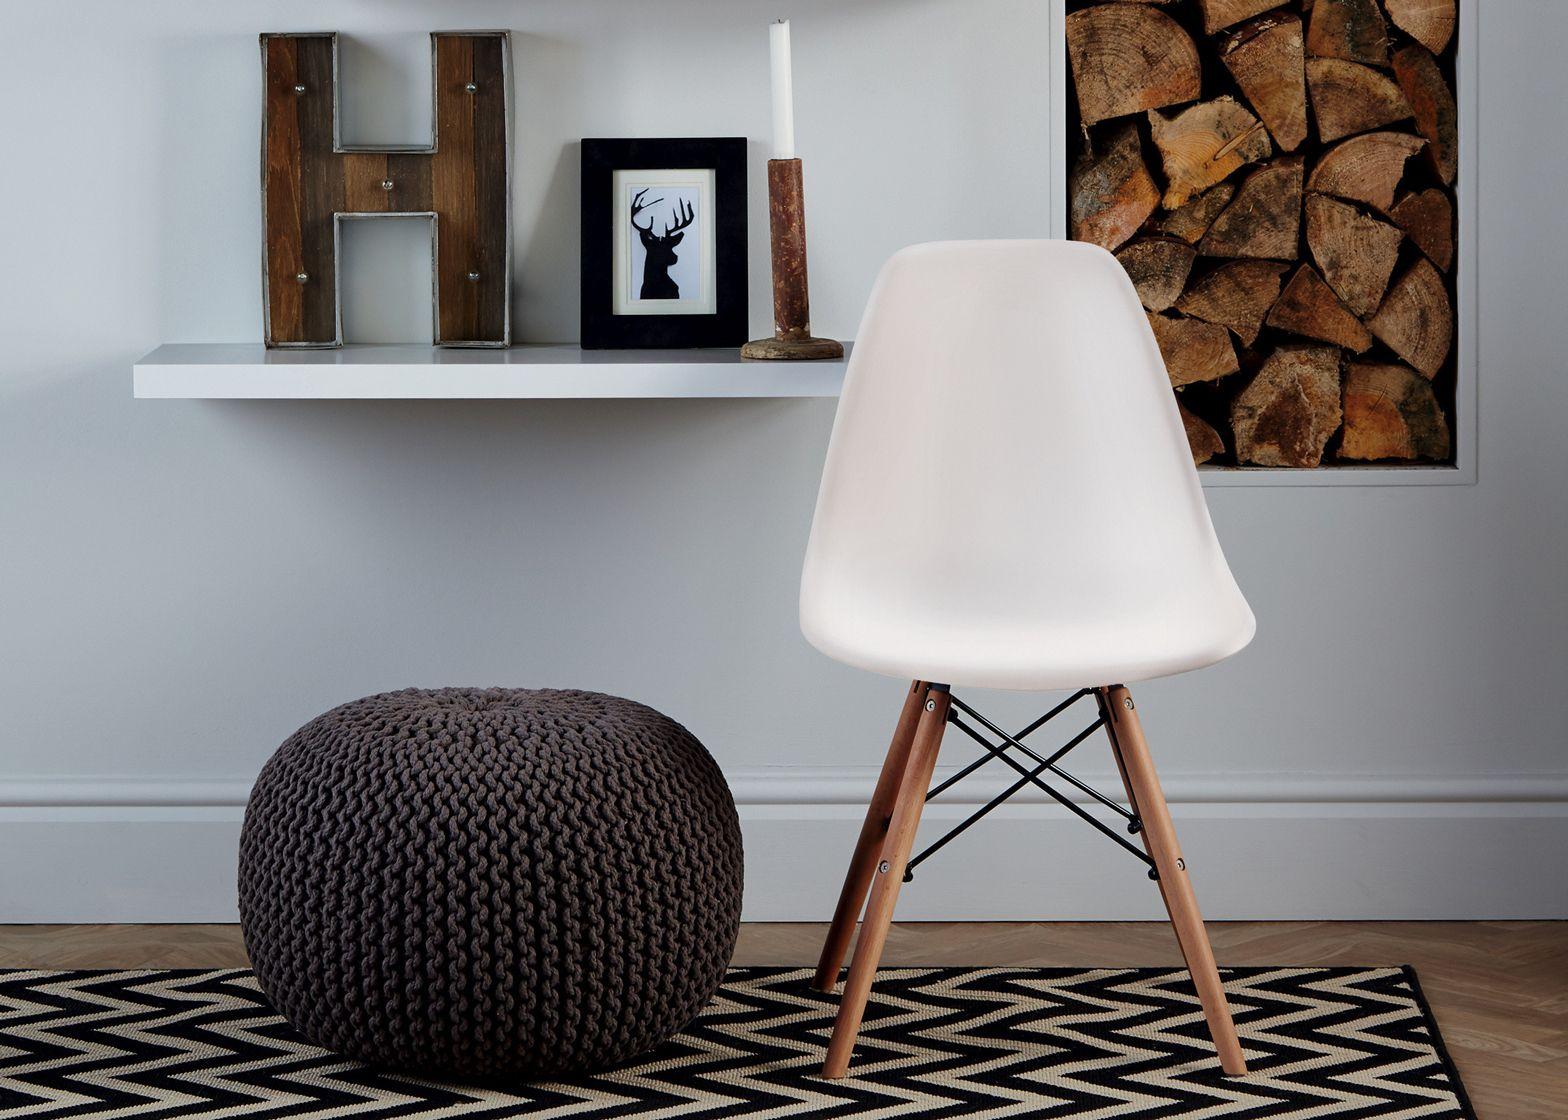 Sensational Budget Supermarket Chain Aldi Is Selling Replica Eames Dsw Inzonedesignstudio Interior Chair Design Inzonedesignstudiocom